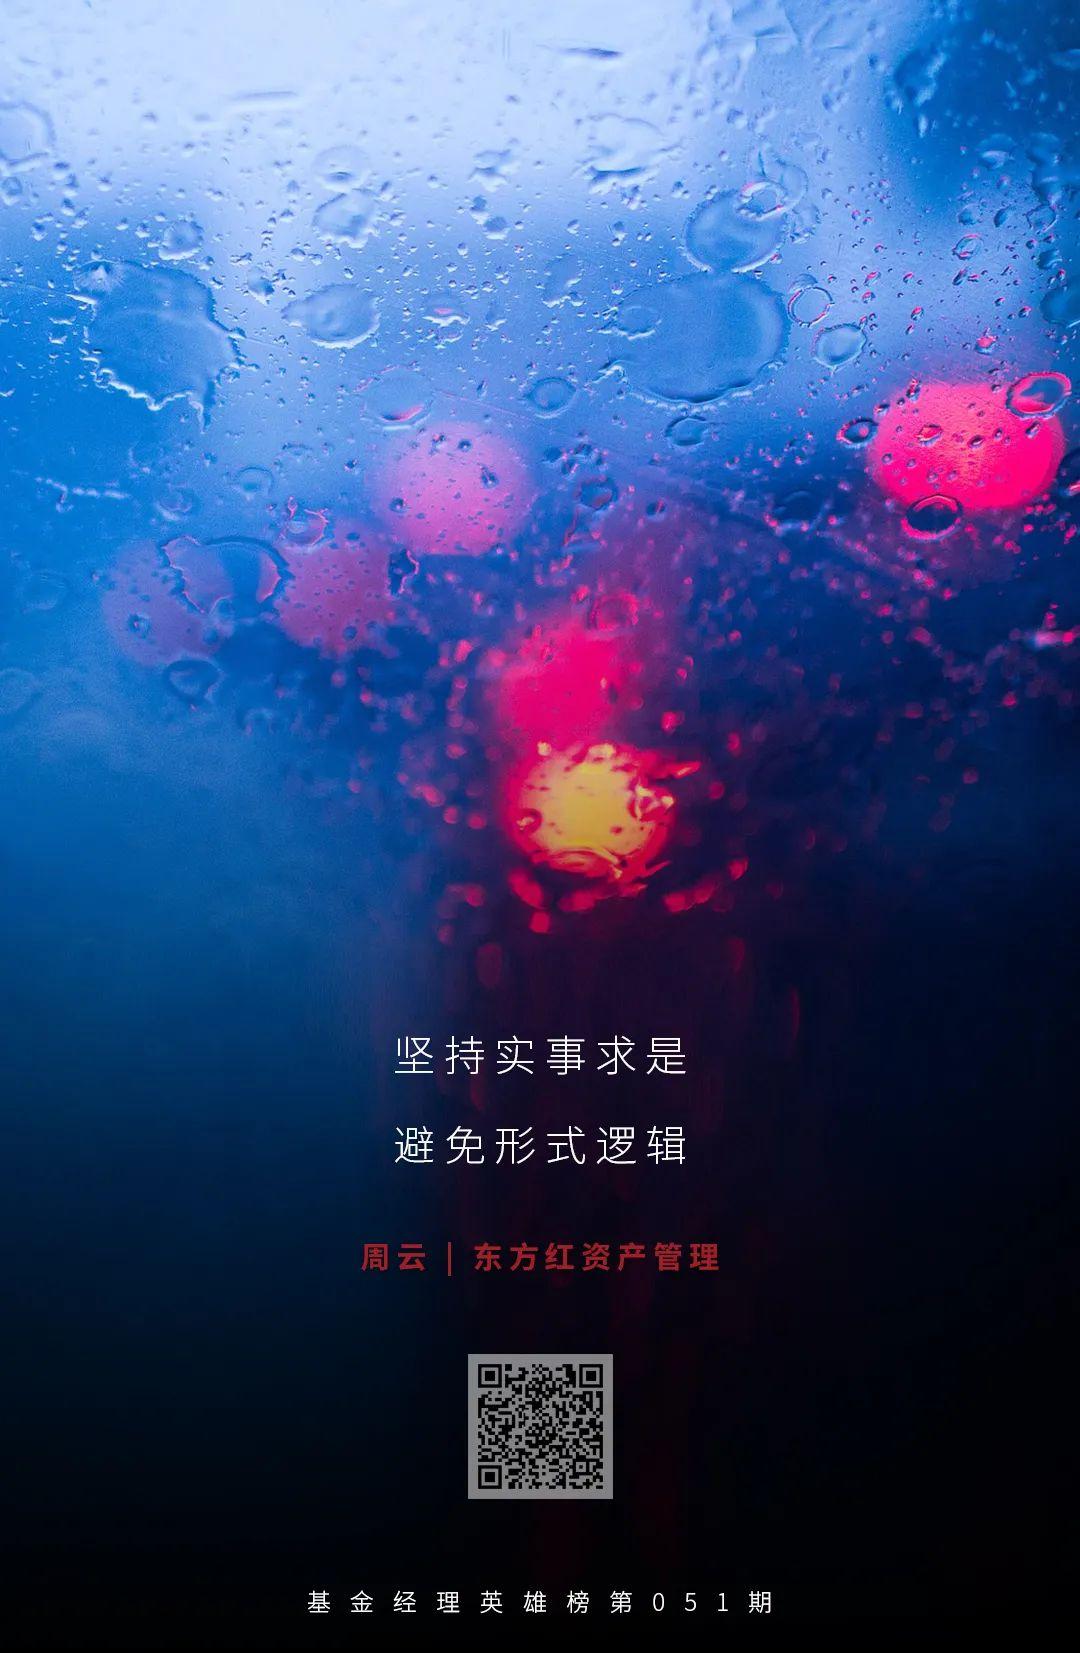 http://www.gyw007.com/nanhaixinwen/467983.html